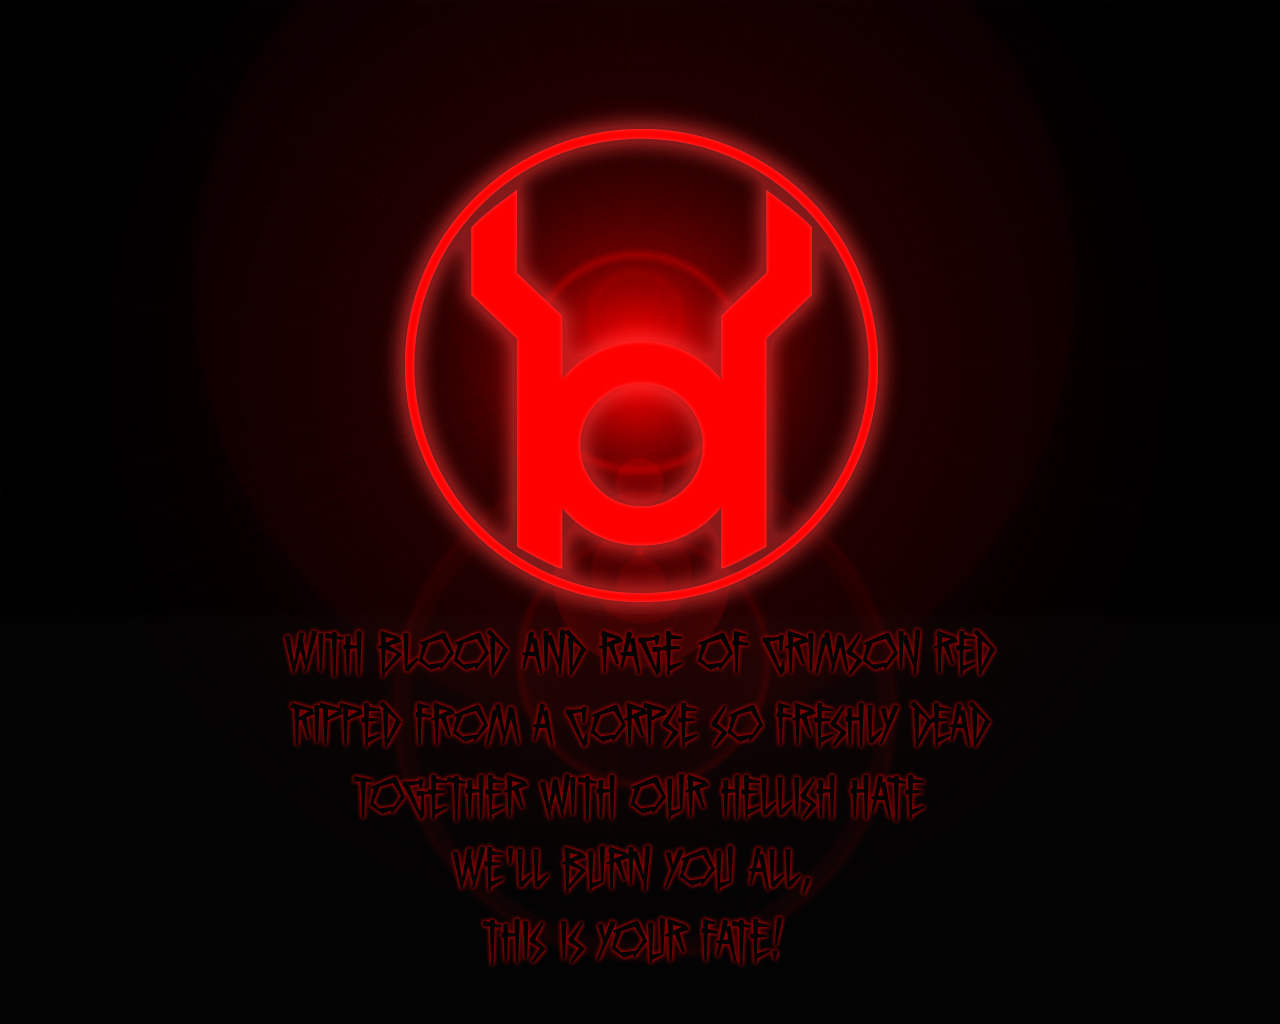 GL Desktop Red Lantern Oath by saikat4ever 1280x1024